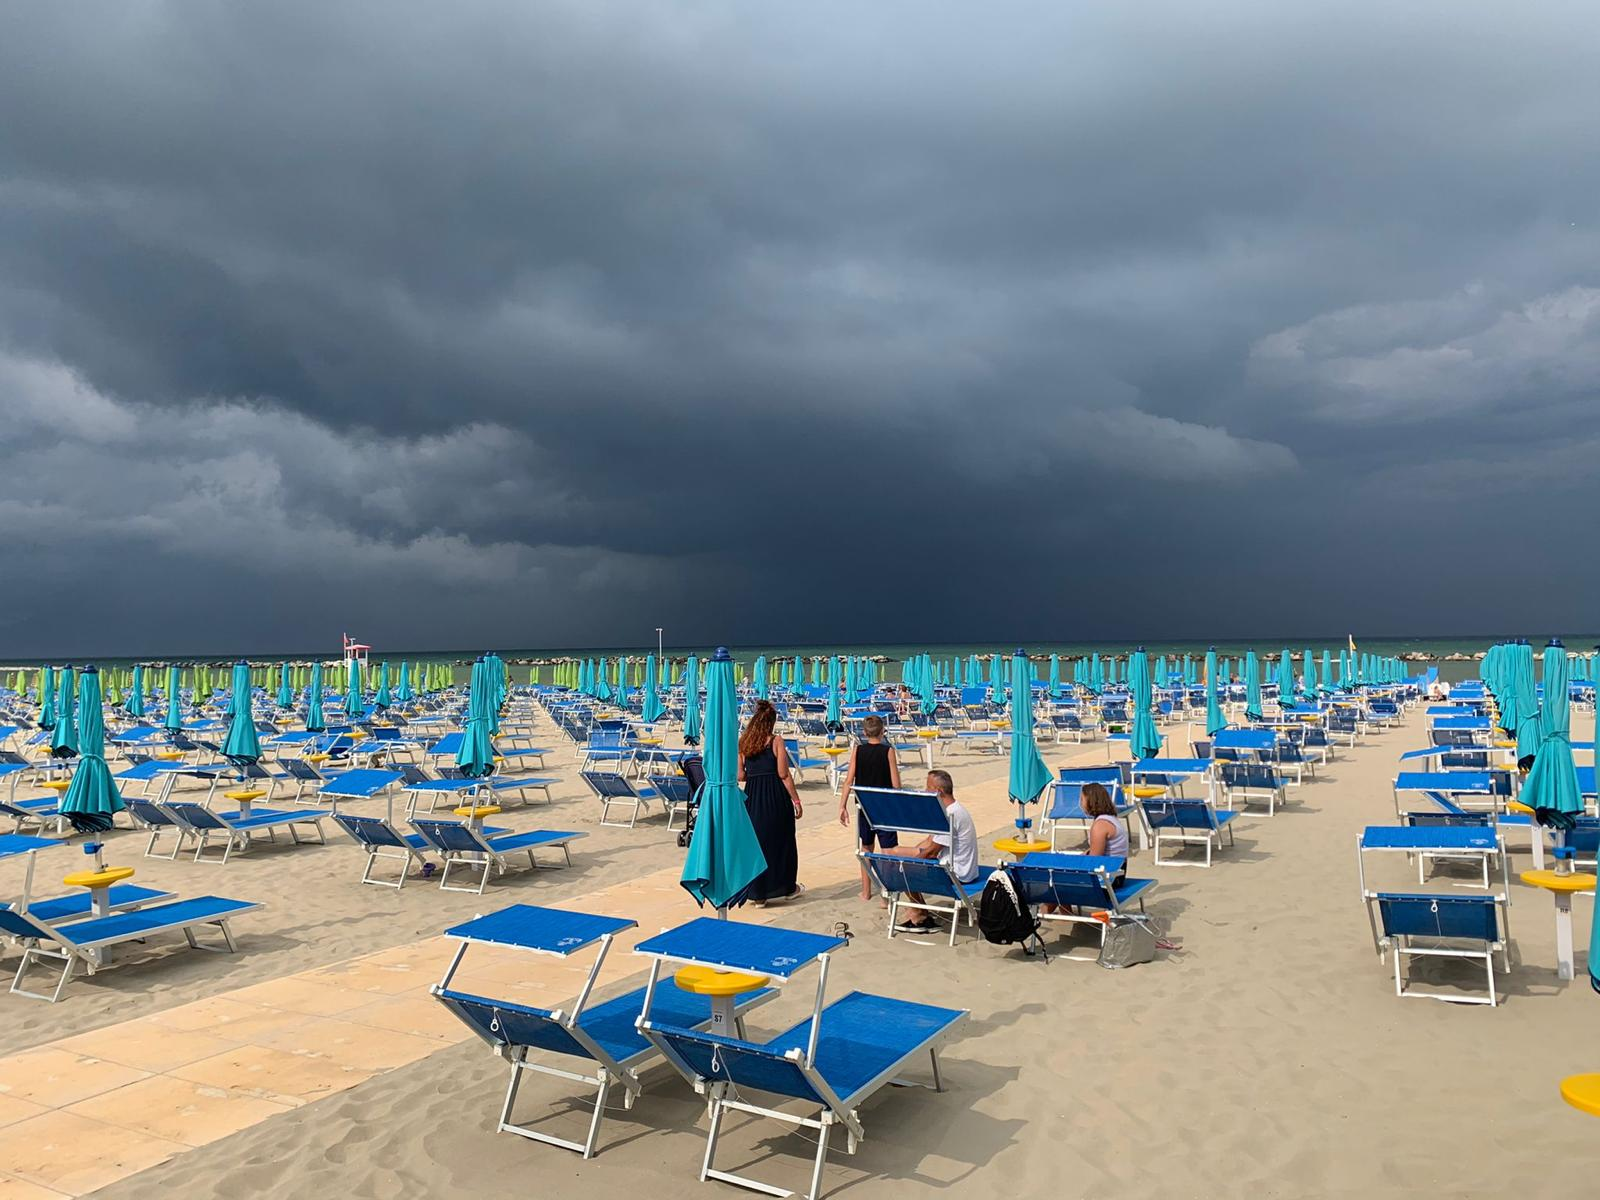 Grandi Spiagge